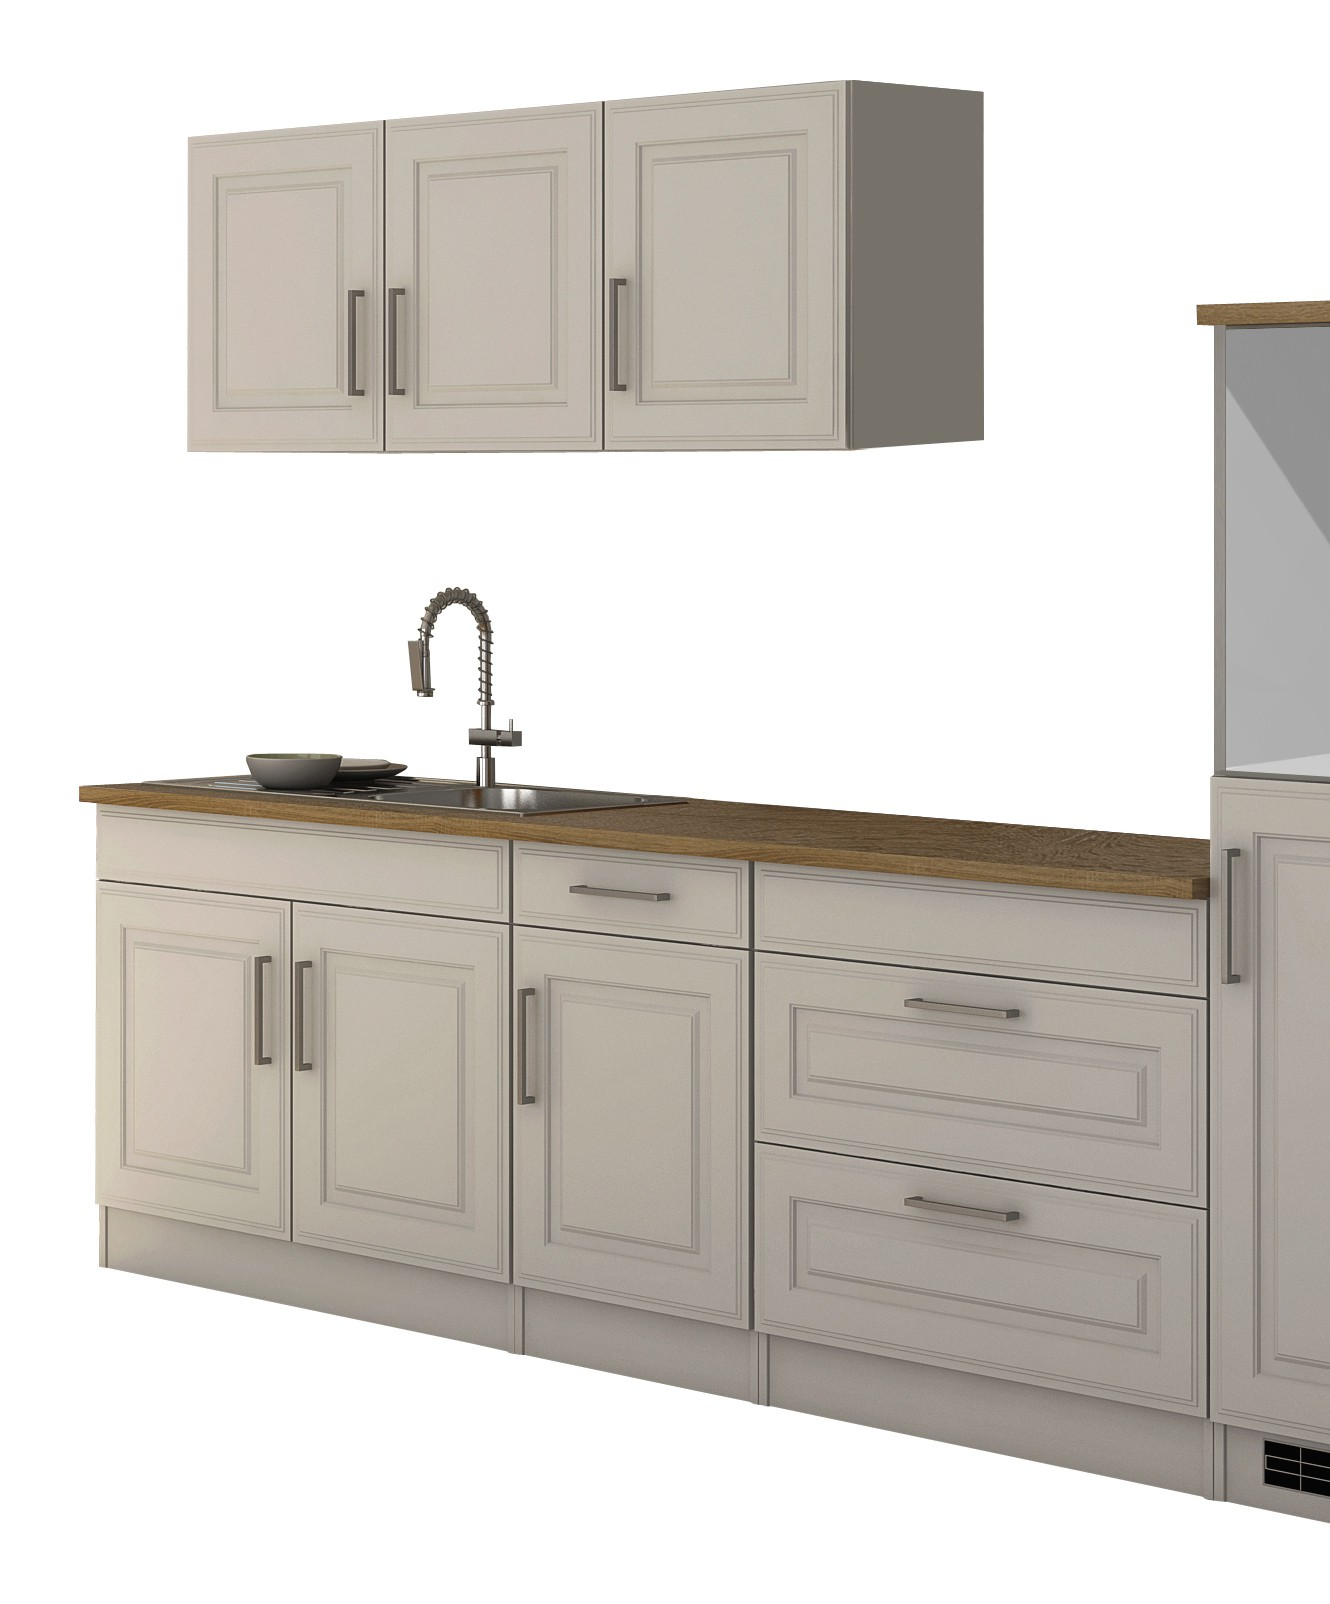 k chenzeile k ln k chen leerblock k chenblock 290 cm weiss ebay. Black Bedroom Furniture Sets. Home Design Ideas